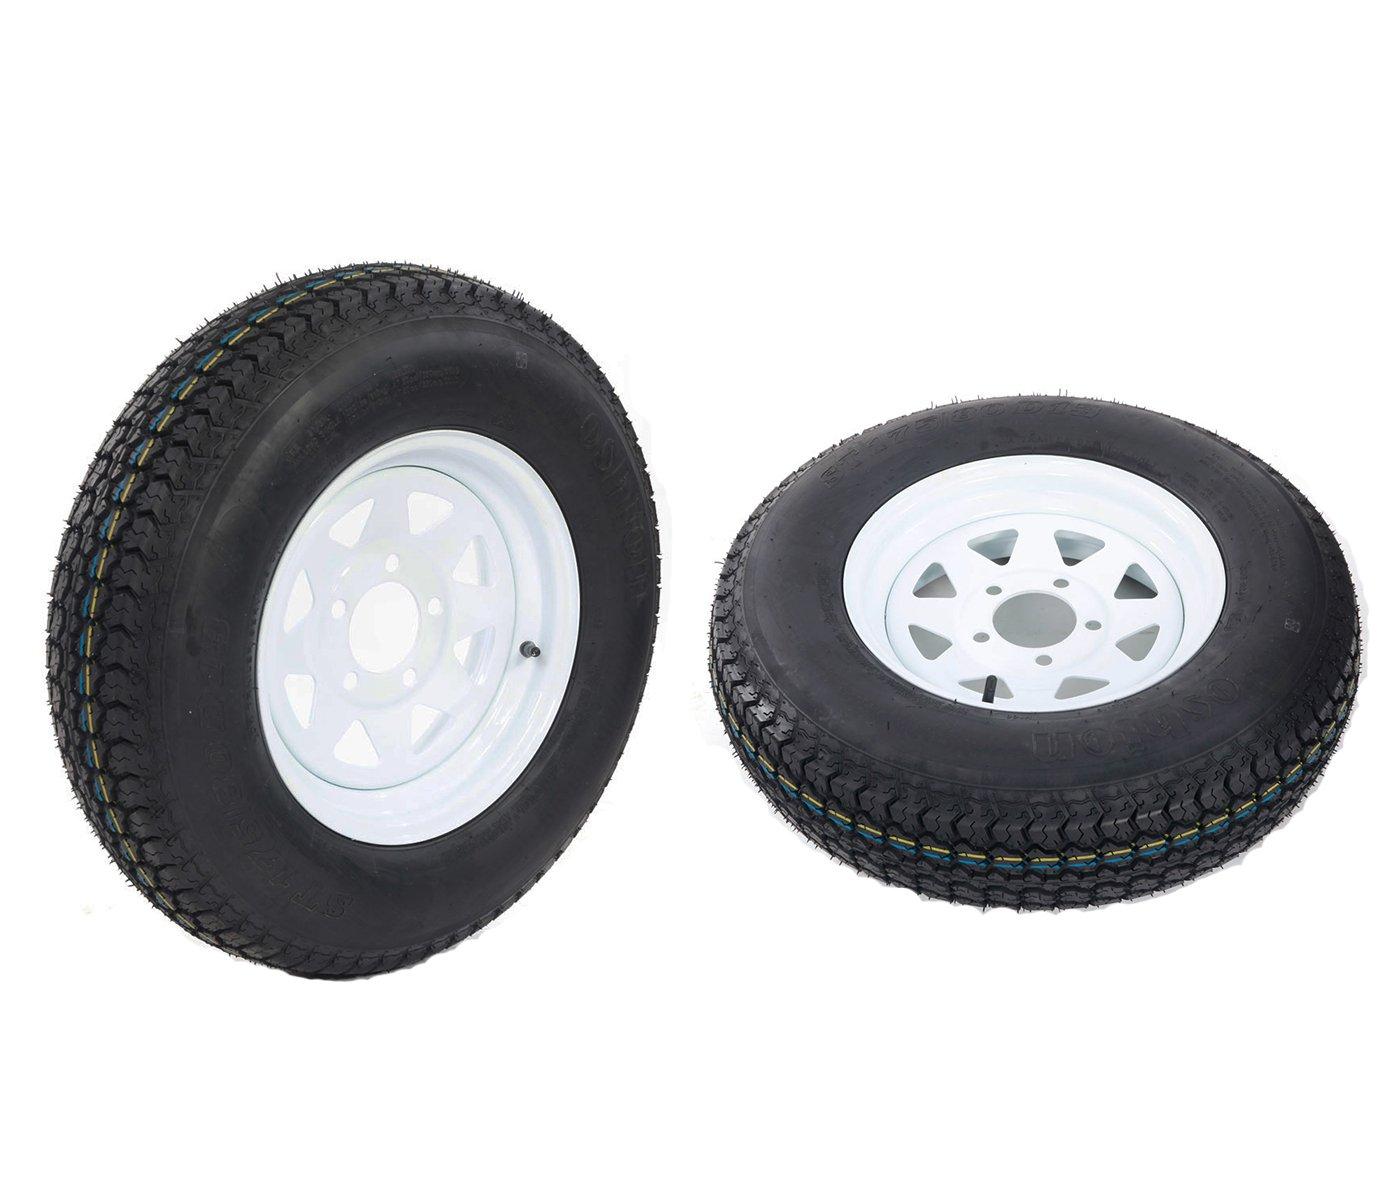 Set of 2 LRC ET Bias Trailer Tire Mounted on 13'' White Spoke 5 Lug Wheel, ST175/80D13